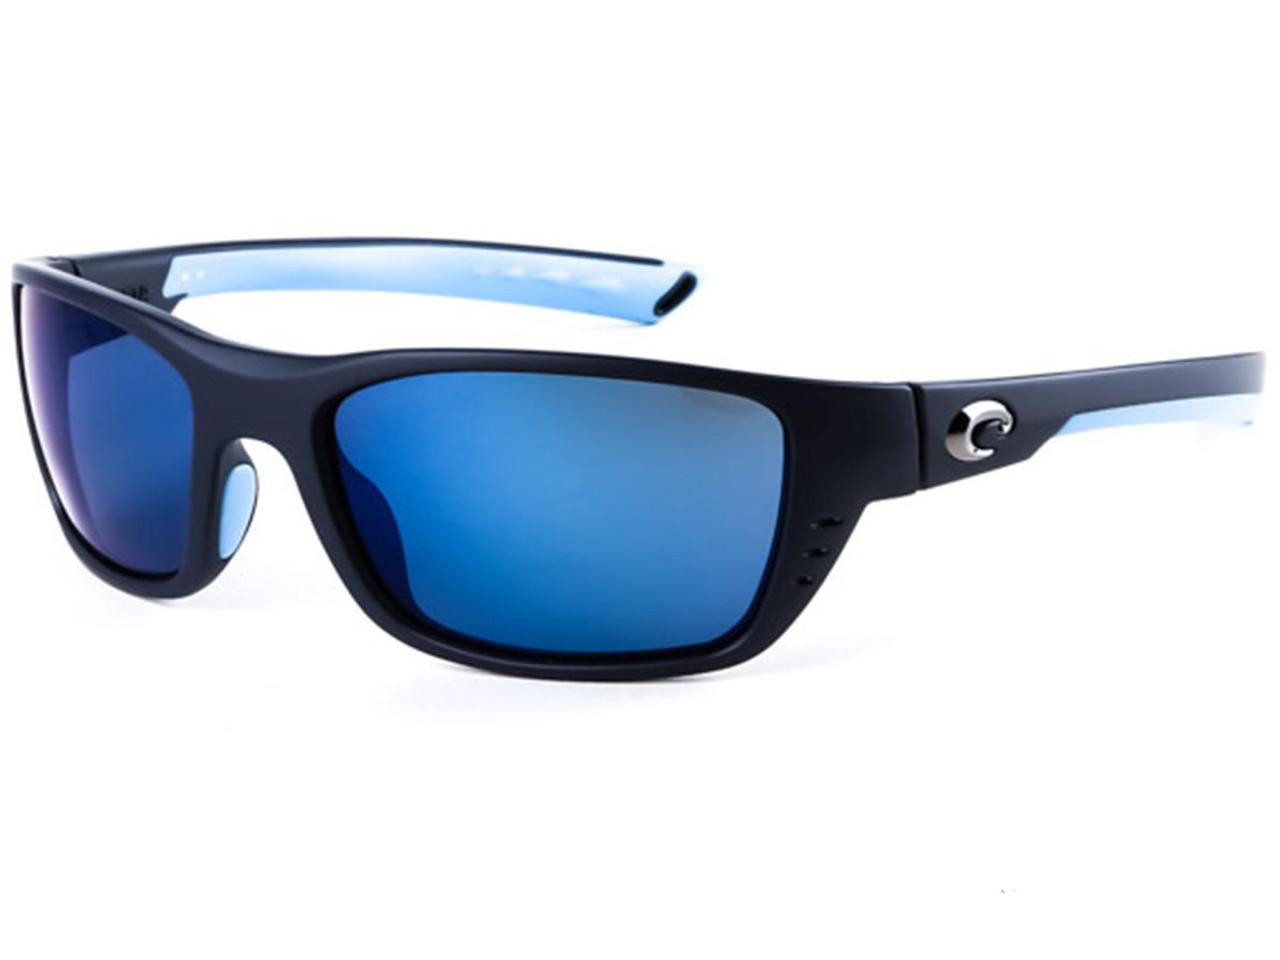 6b10128f5f Costa Del Mar - Whitetip Polarized Sunglasses (Color  Matte Heron   580p  Blue Mirror) - Hero Outdoors